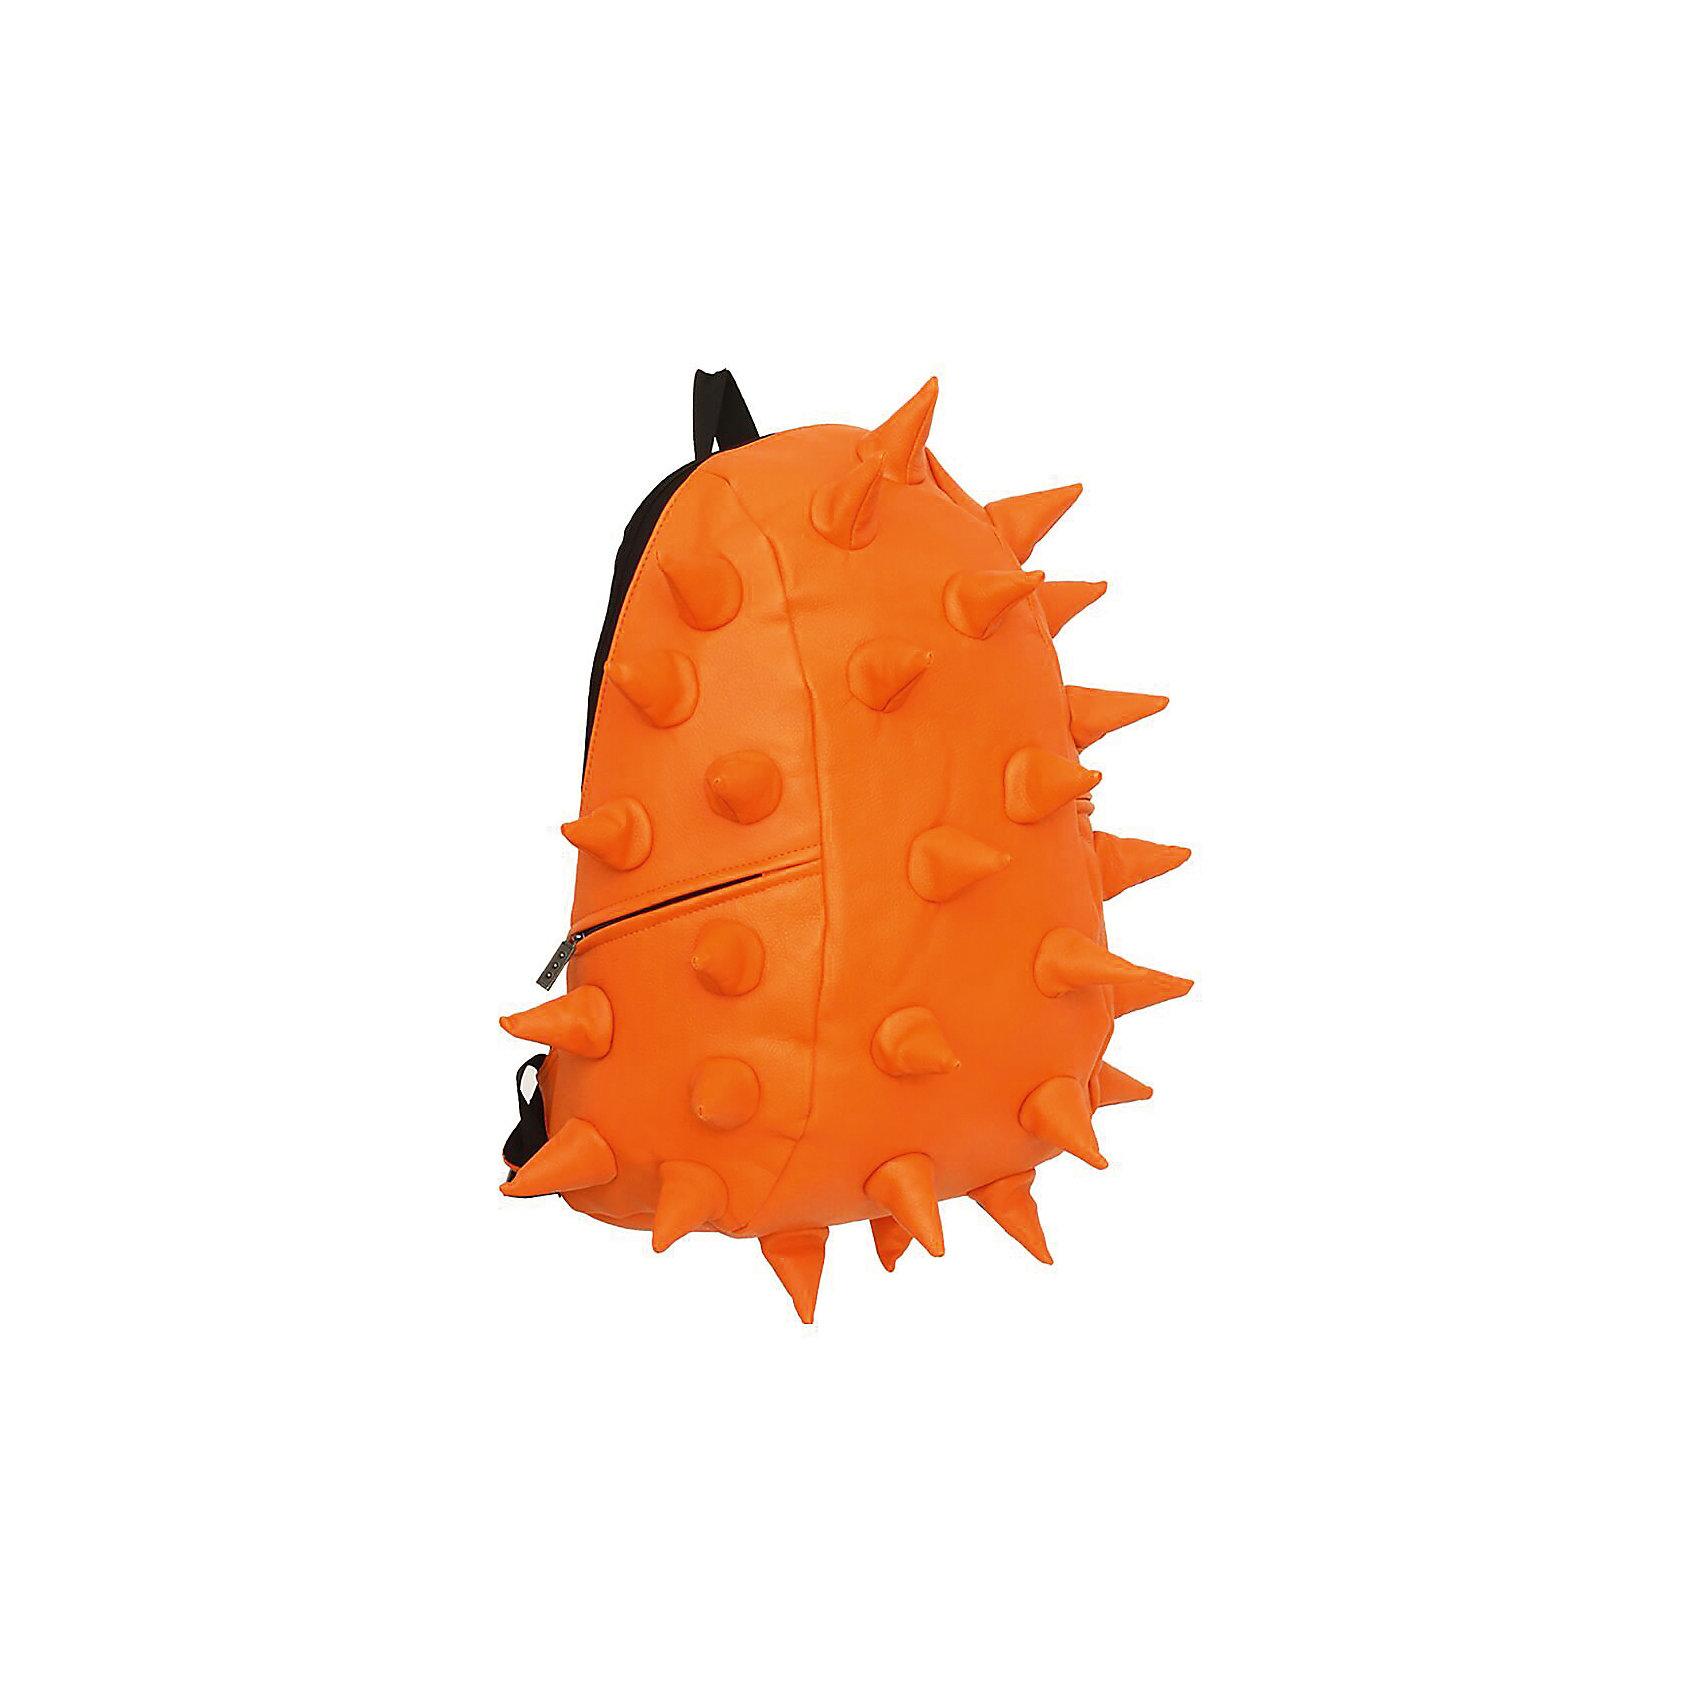 Рюкзак Rex Full, цвет Orange Peel (оранжевый)Рюкзаки<br>Вес: 0,8 кг<br>Размер: 46х35х20 см<br>Состав: рюкзак<br>Наличие светоотражающих элементов: нет<br>Материал: полиуретан<br><br>Ширина мм: 460<br>Глубина мм: 350<br>Высота мм: 200<br>Вес г: 800<br>Возраст от месяцев: 60<br>Возраст до месяцев: 720<br>Пол: Унисекс<br>Возраст: Детский<br>SKU: 7054091